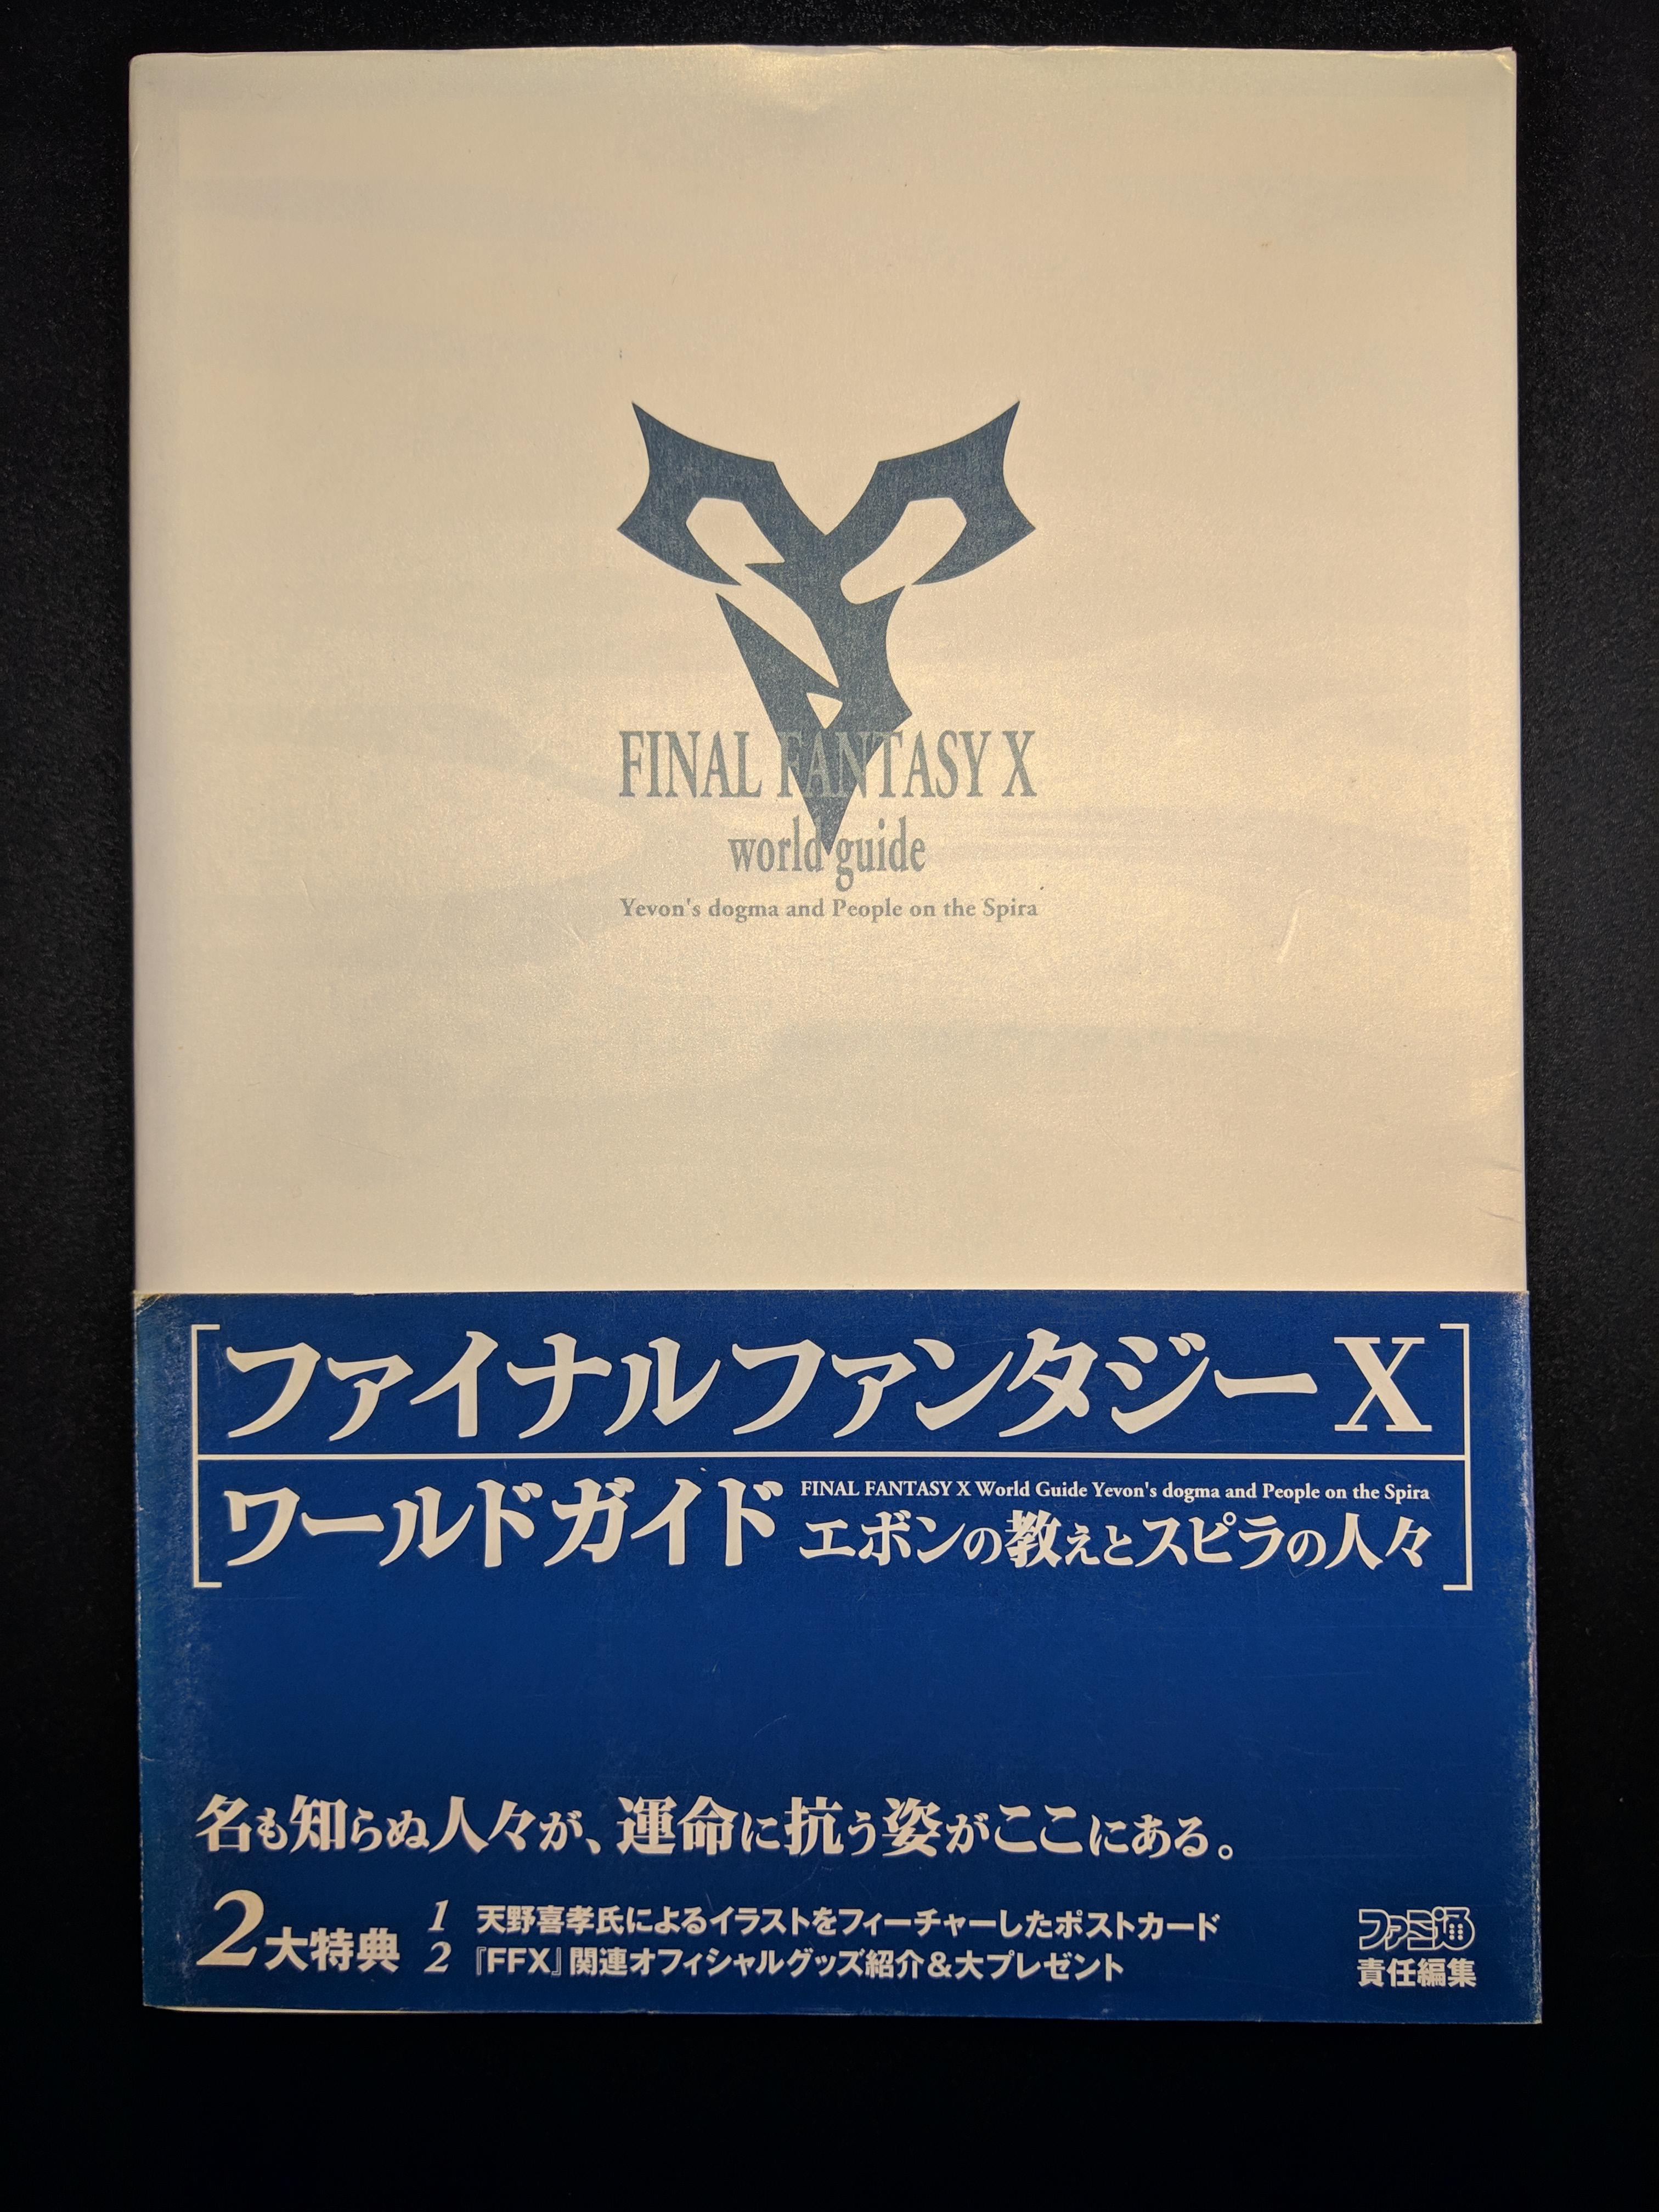 Final Fantasy X World Guide